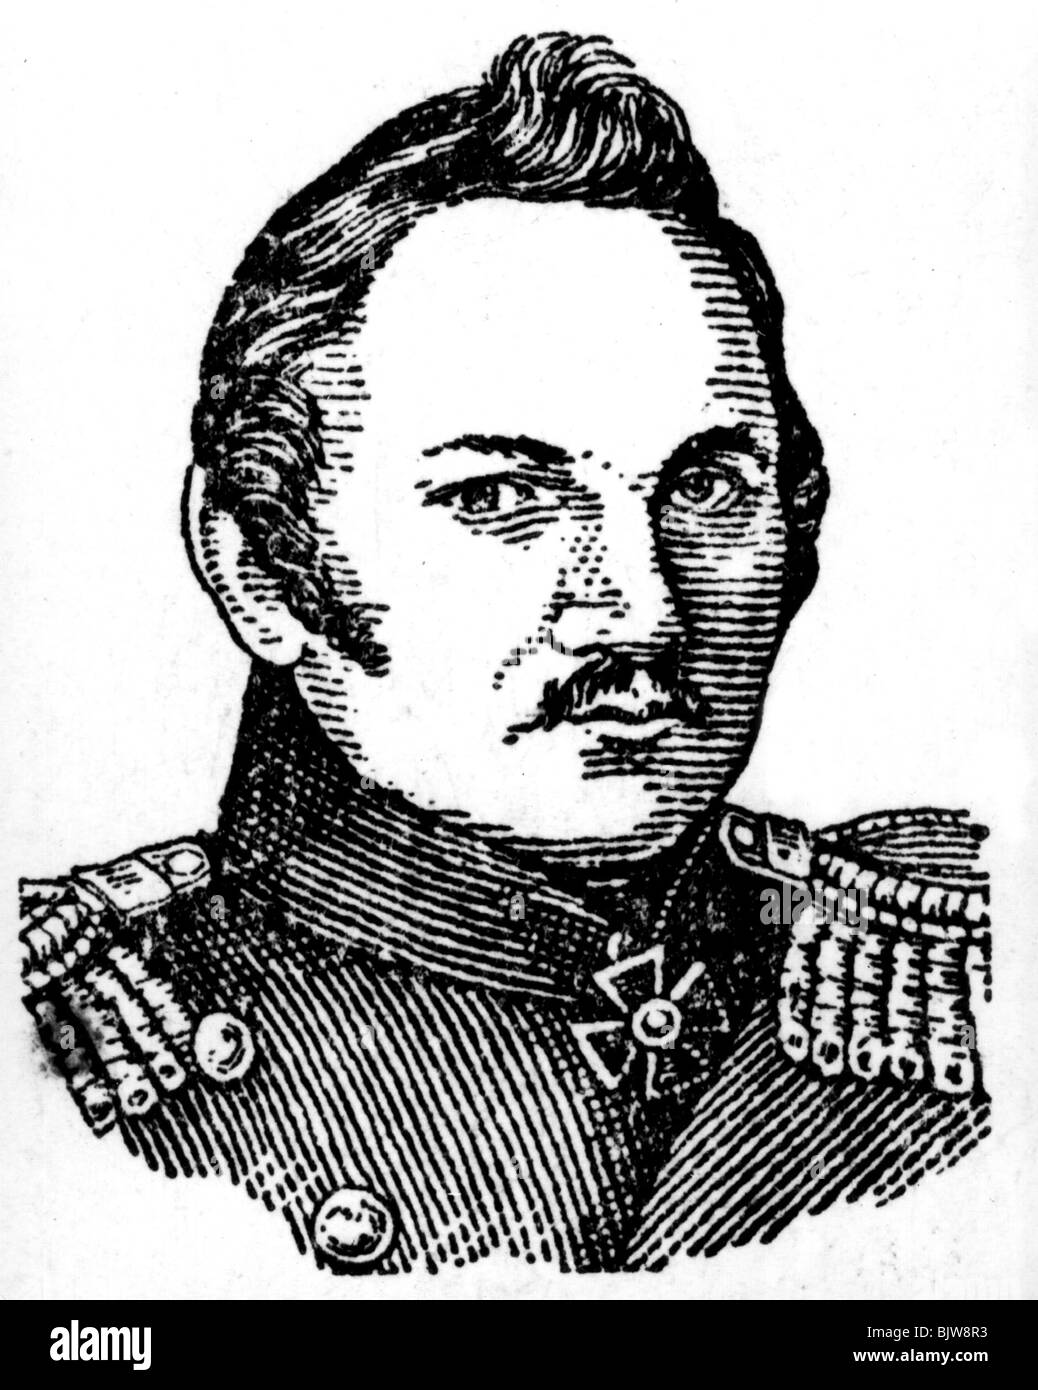 Bellingshausen, Fabian von, 20.9.1778 - 25.1.1852, Russian navigator and Antarctic explorer, portrait, later drawing, - Stock Image